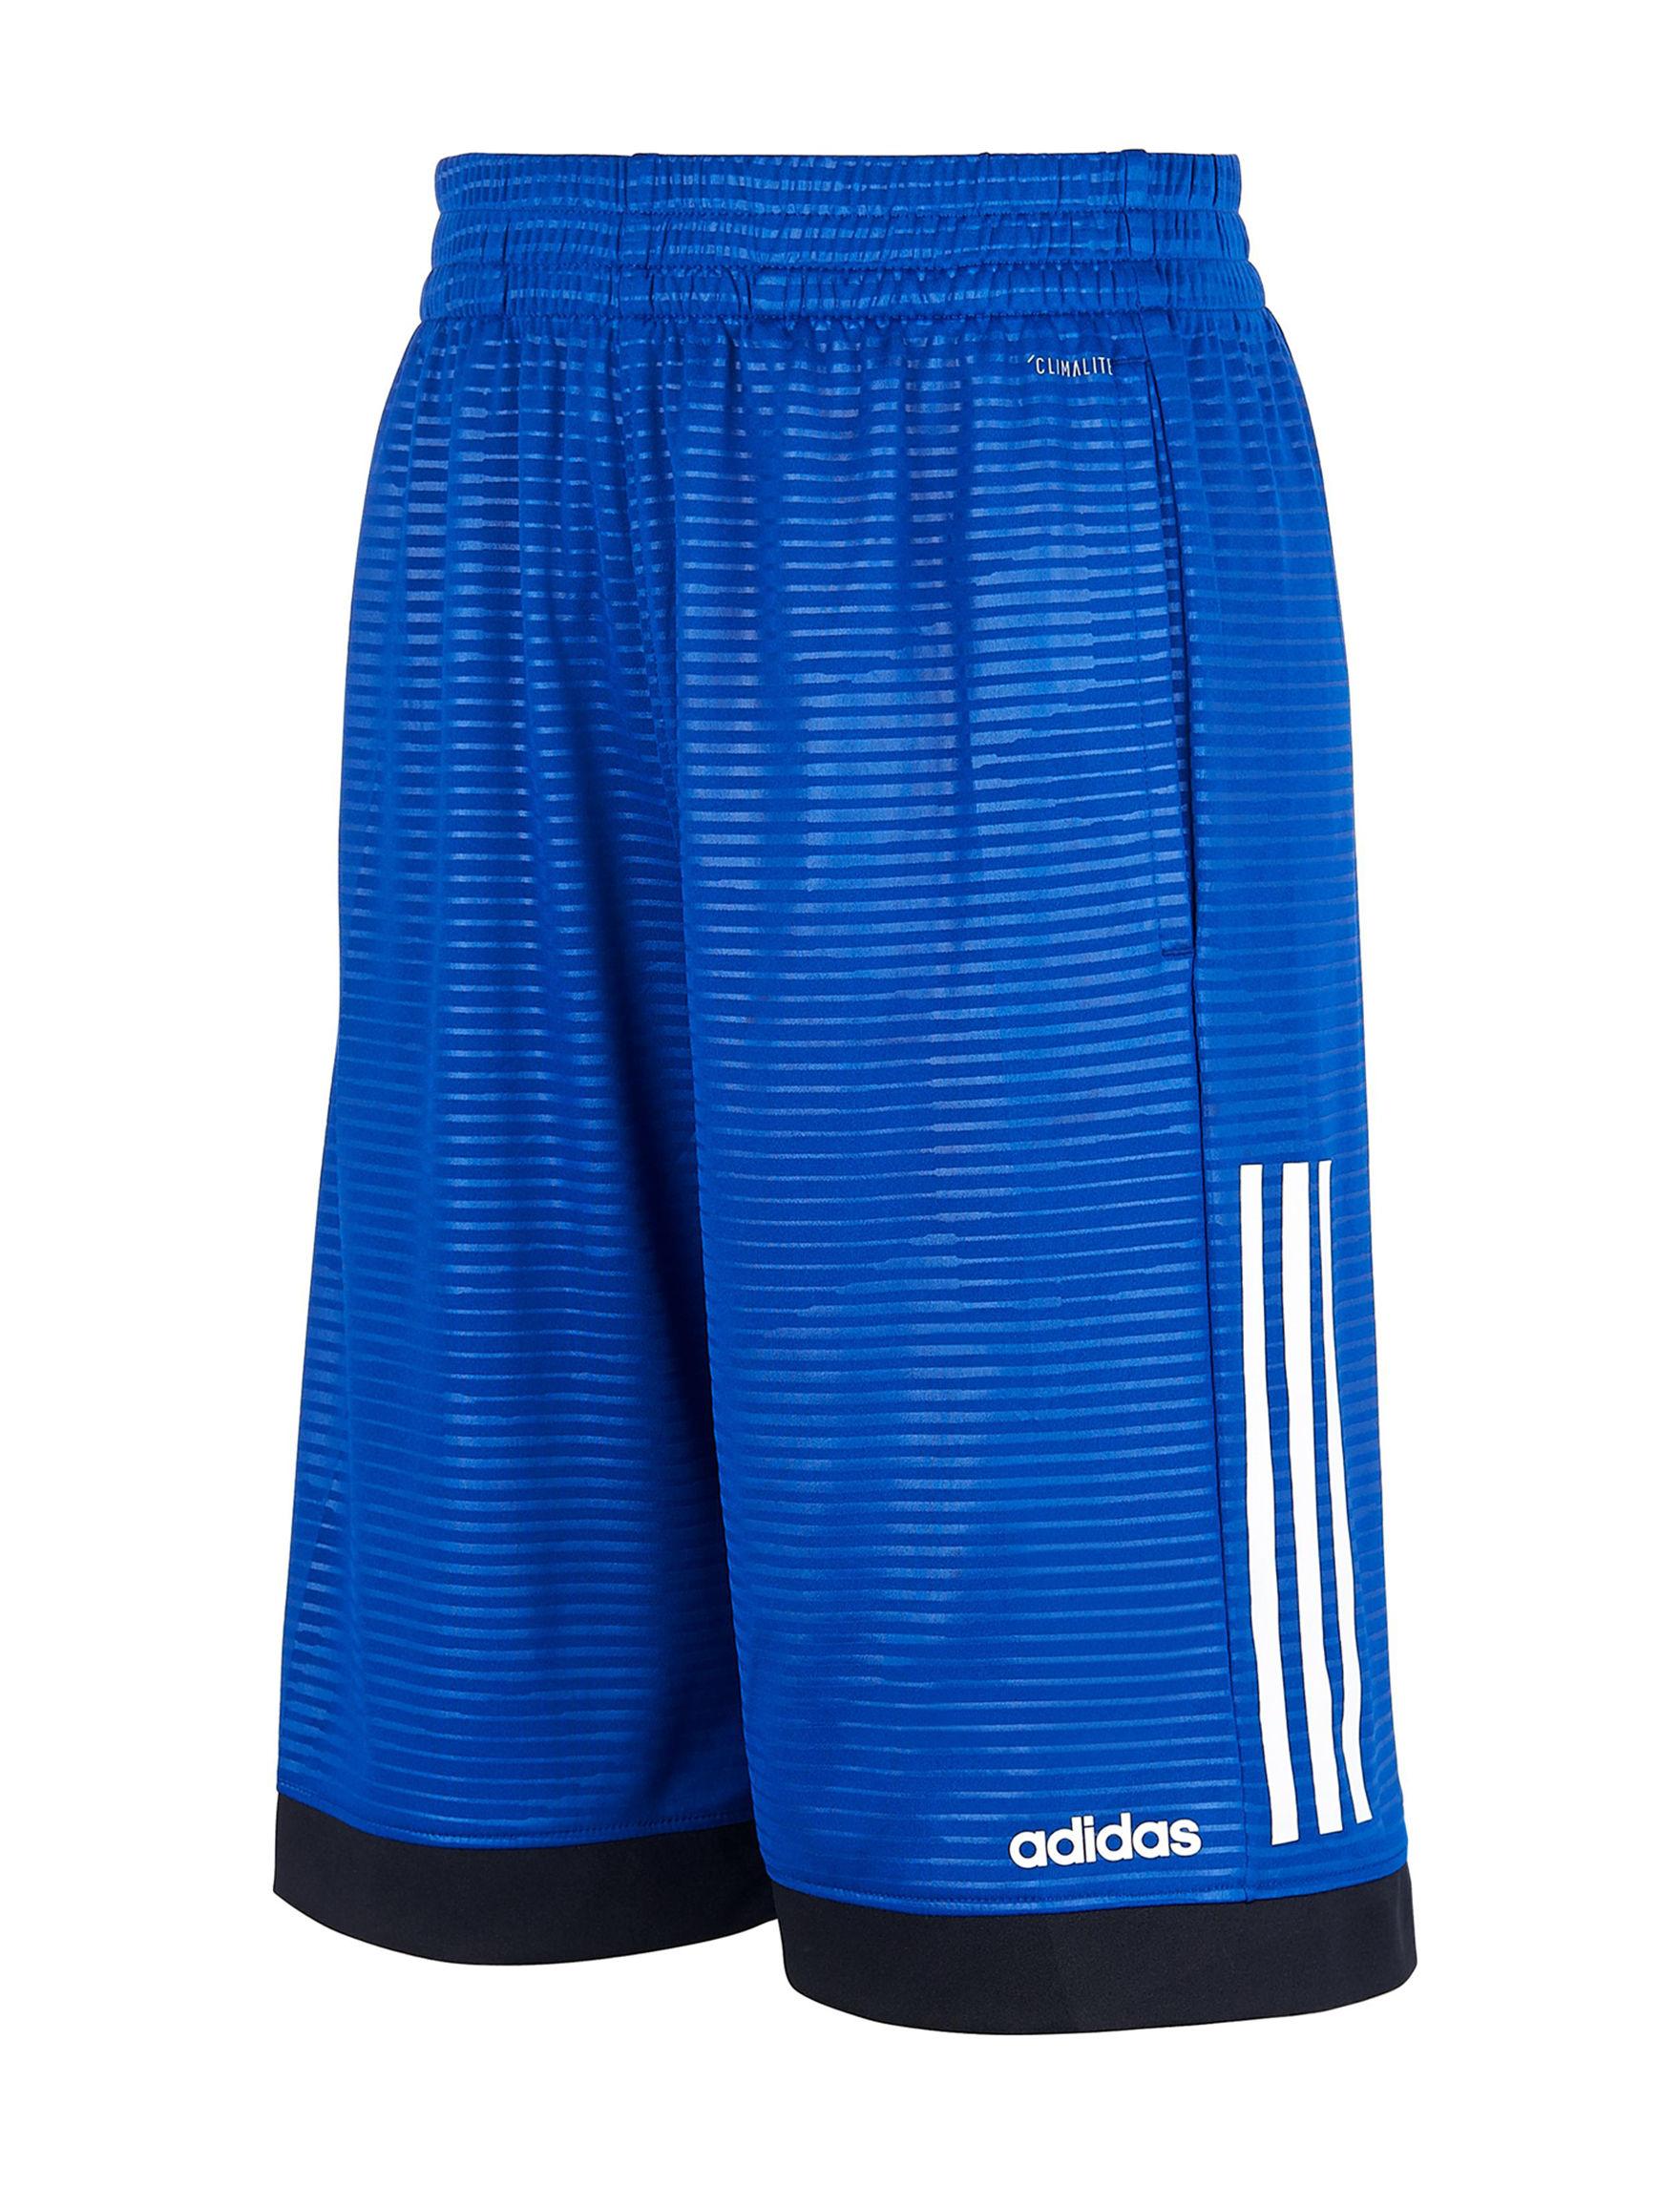 Adidas Royal Blue Relaxed